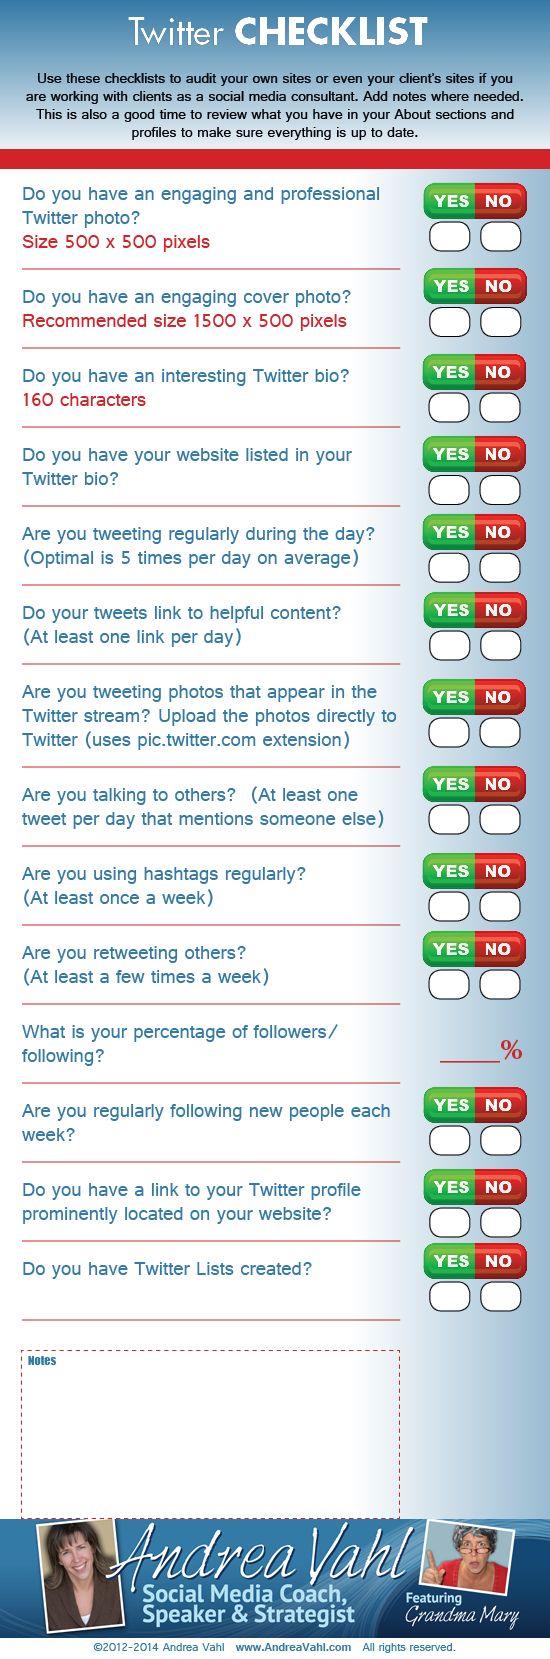 #Twitter Checklist — #infographic #socialmedia